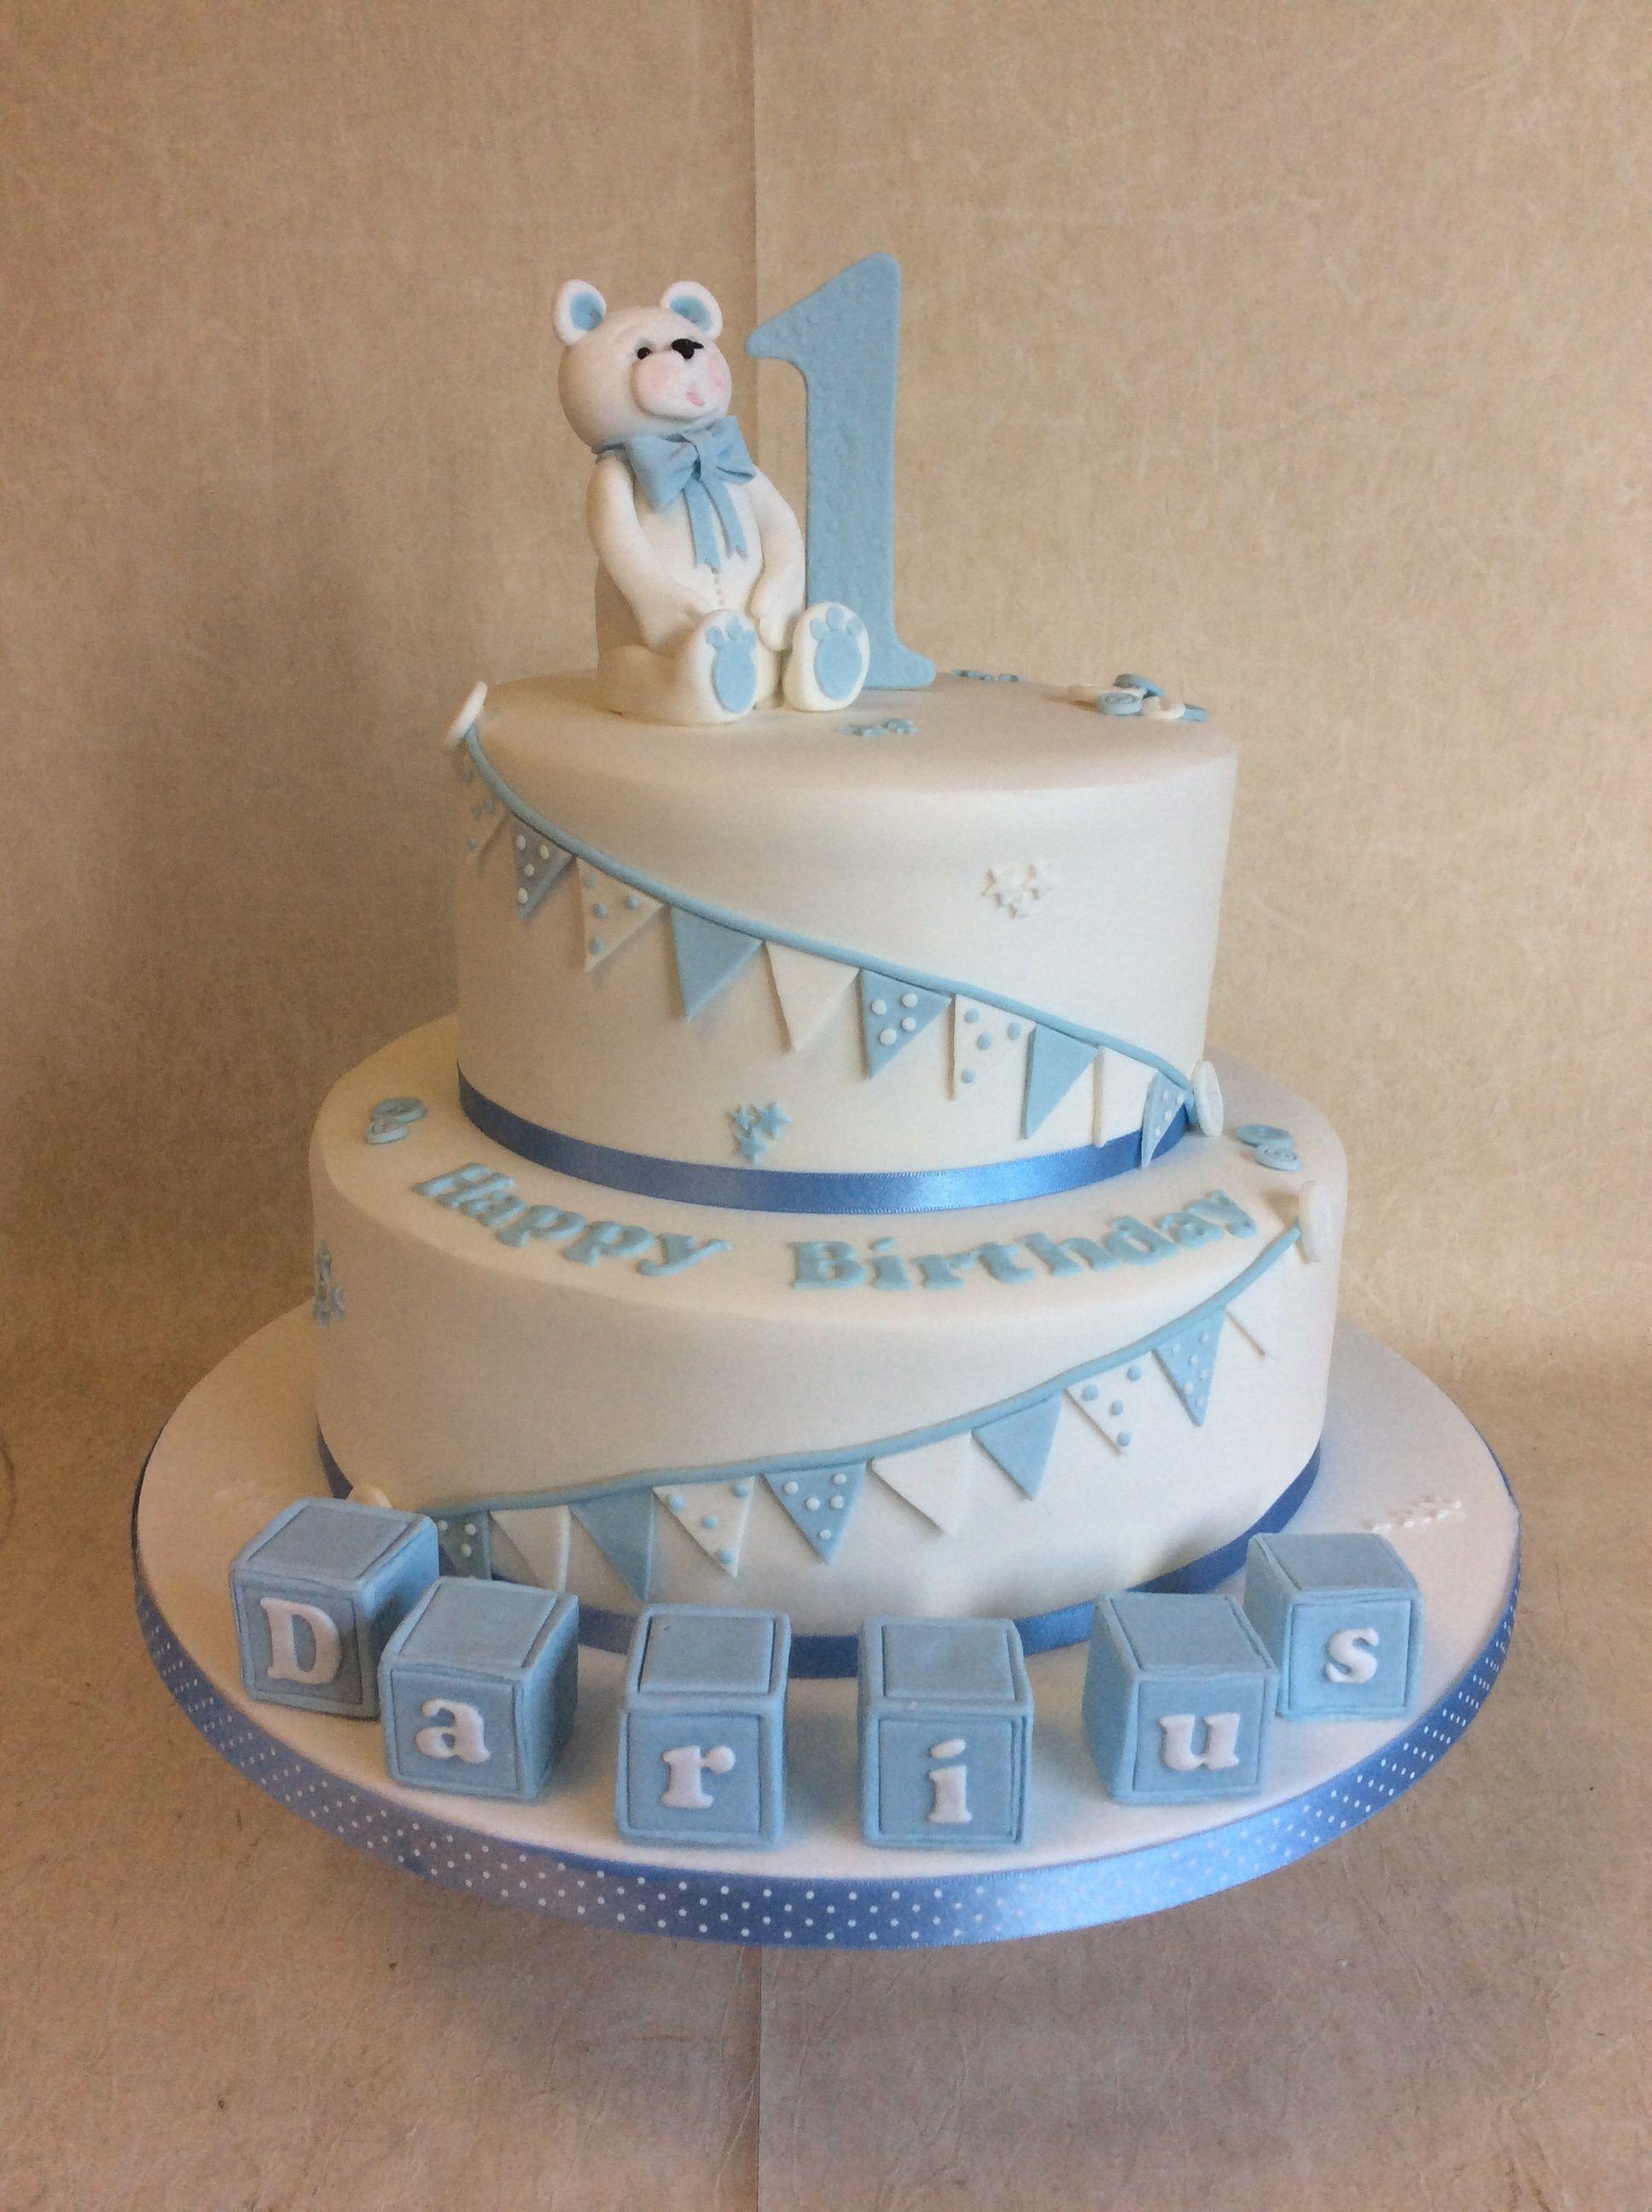 Superb 2 Tier Baby Blue White 1St Birthday Cake With Blocks Bunting Personalised Birthday Cards Sponlily Jamesorg